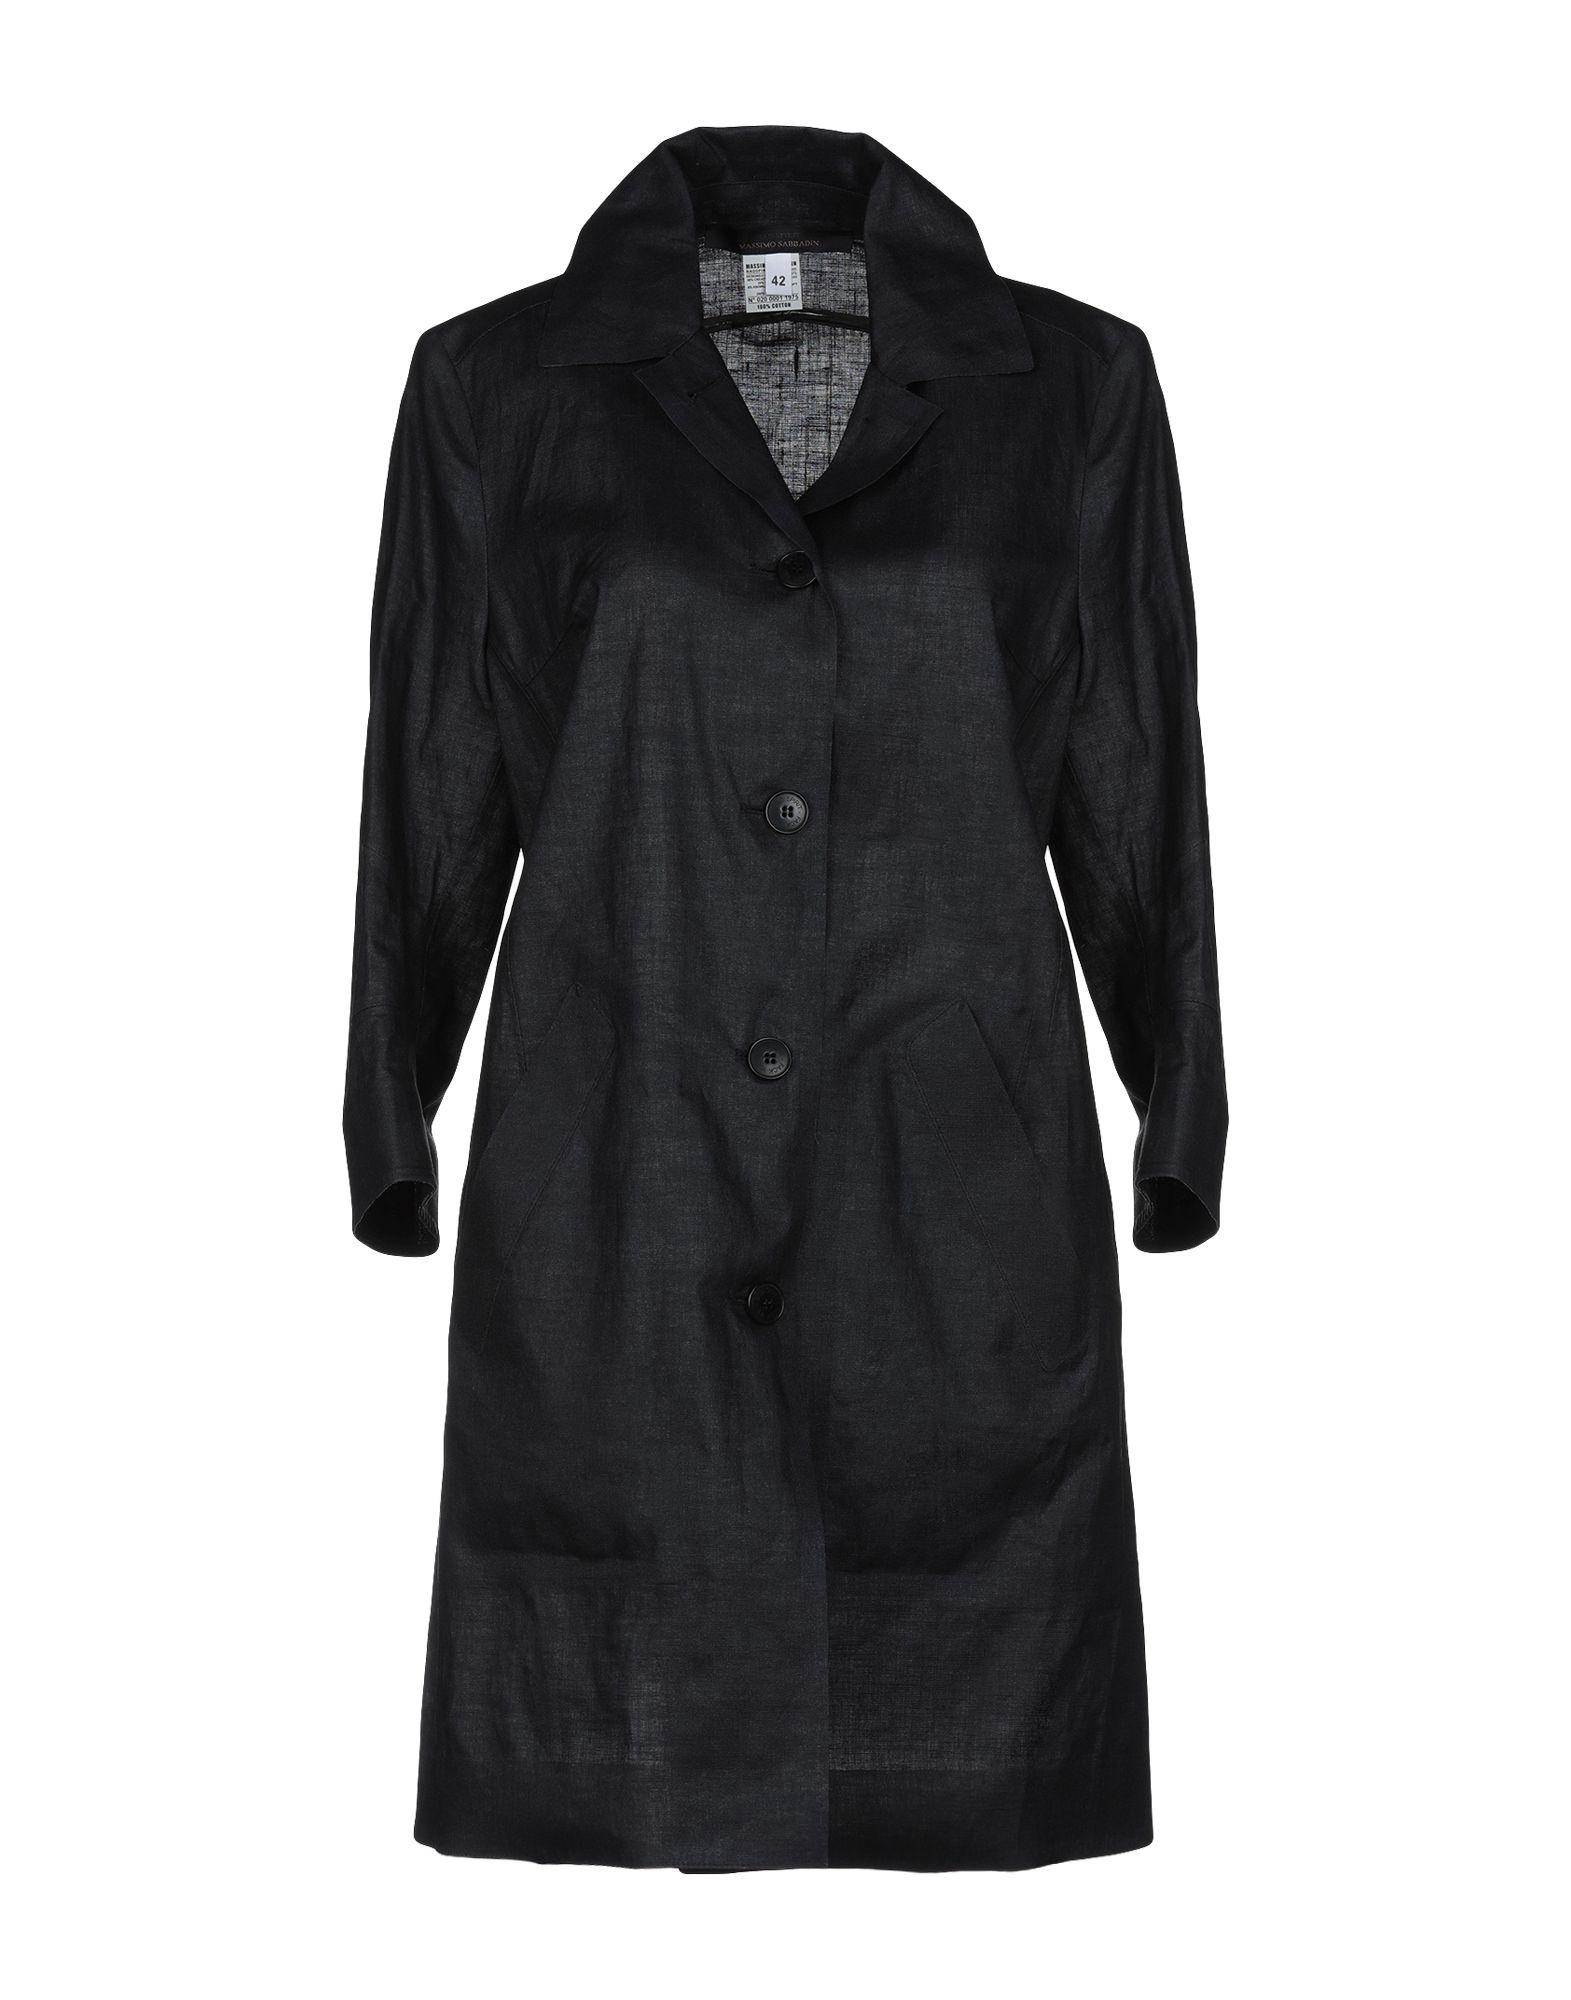 BAD SPIRIT Легкое пальто royal spirit пальто торрент